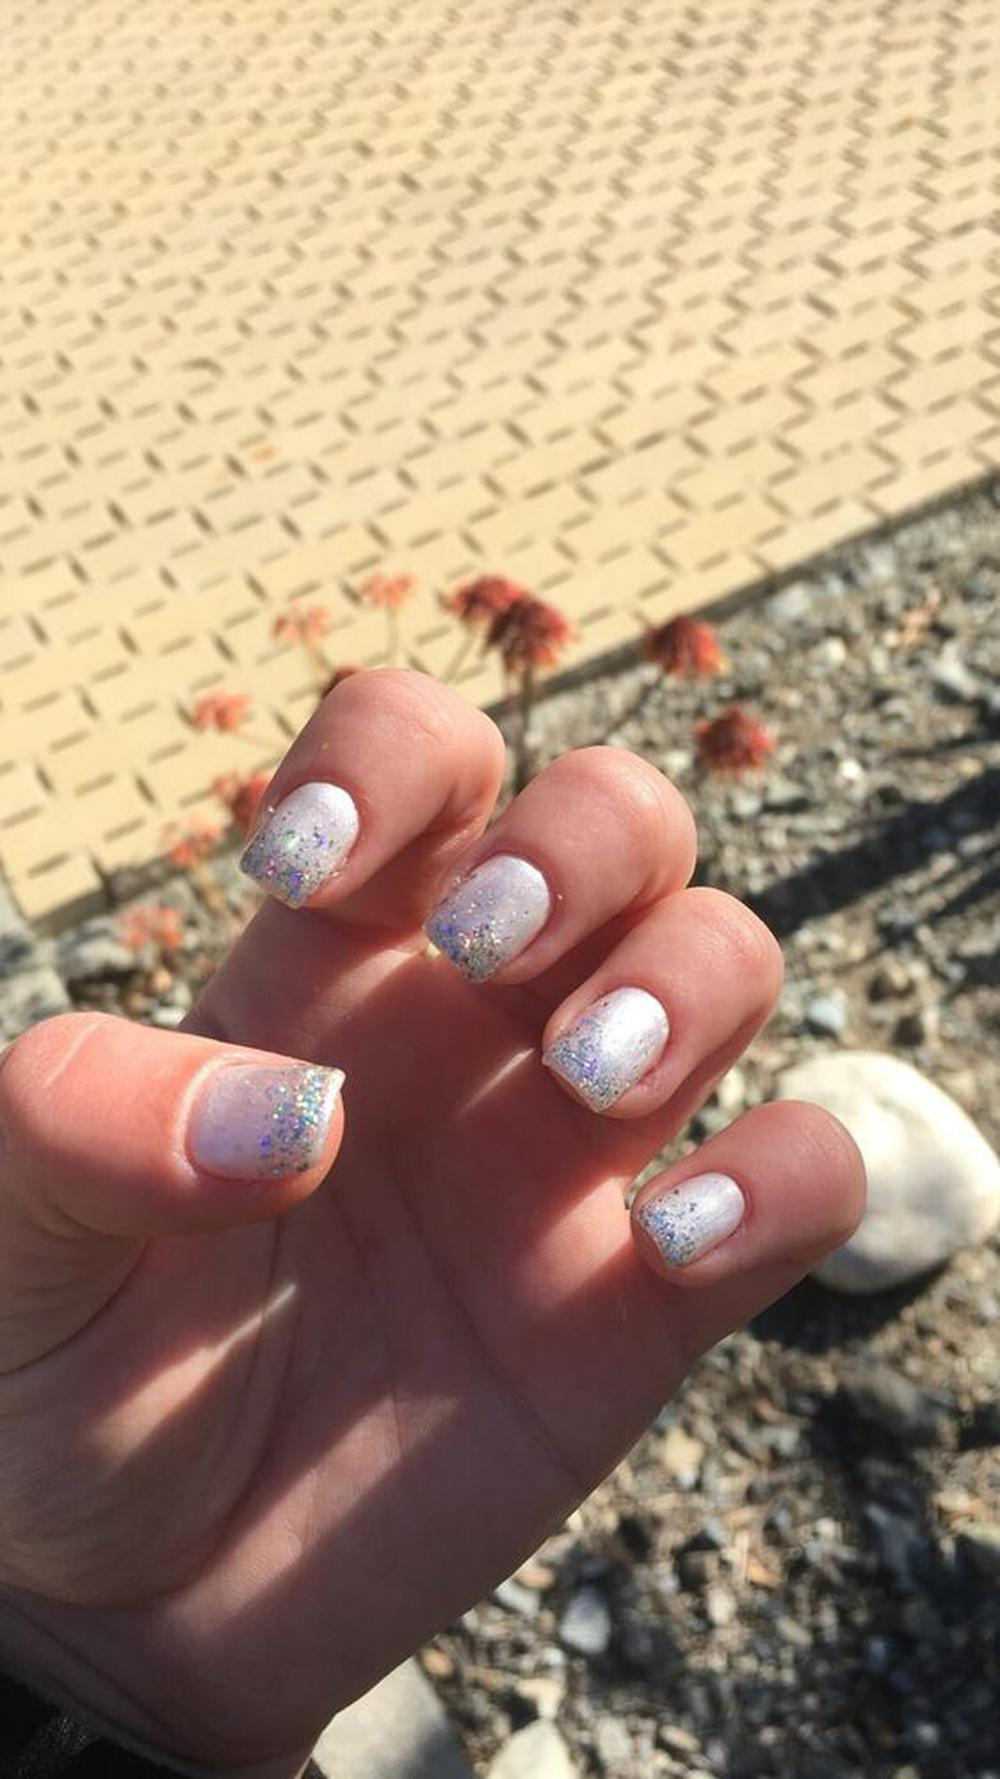 Hands Down Too Nail Salon